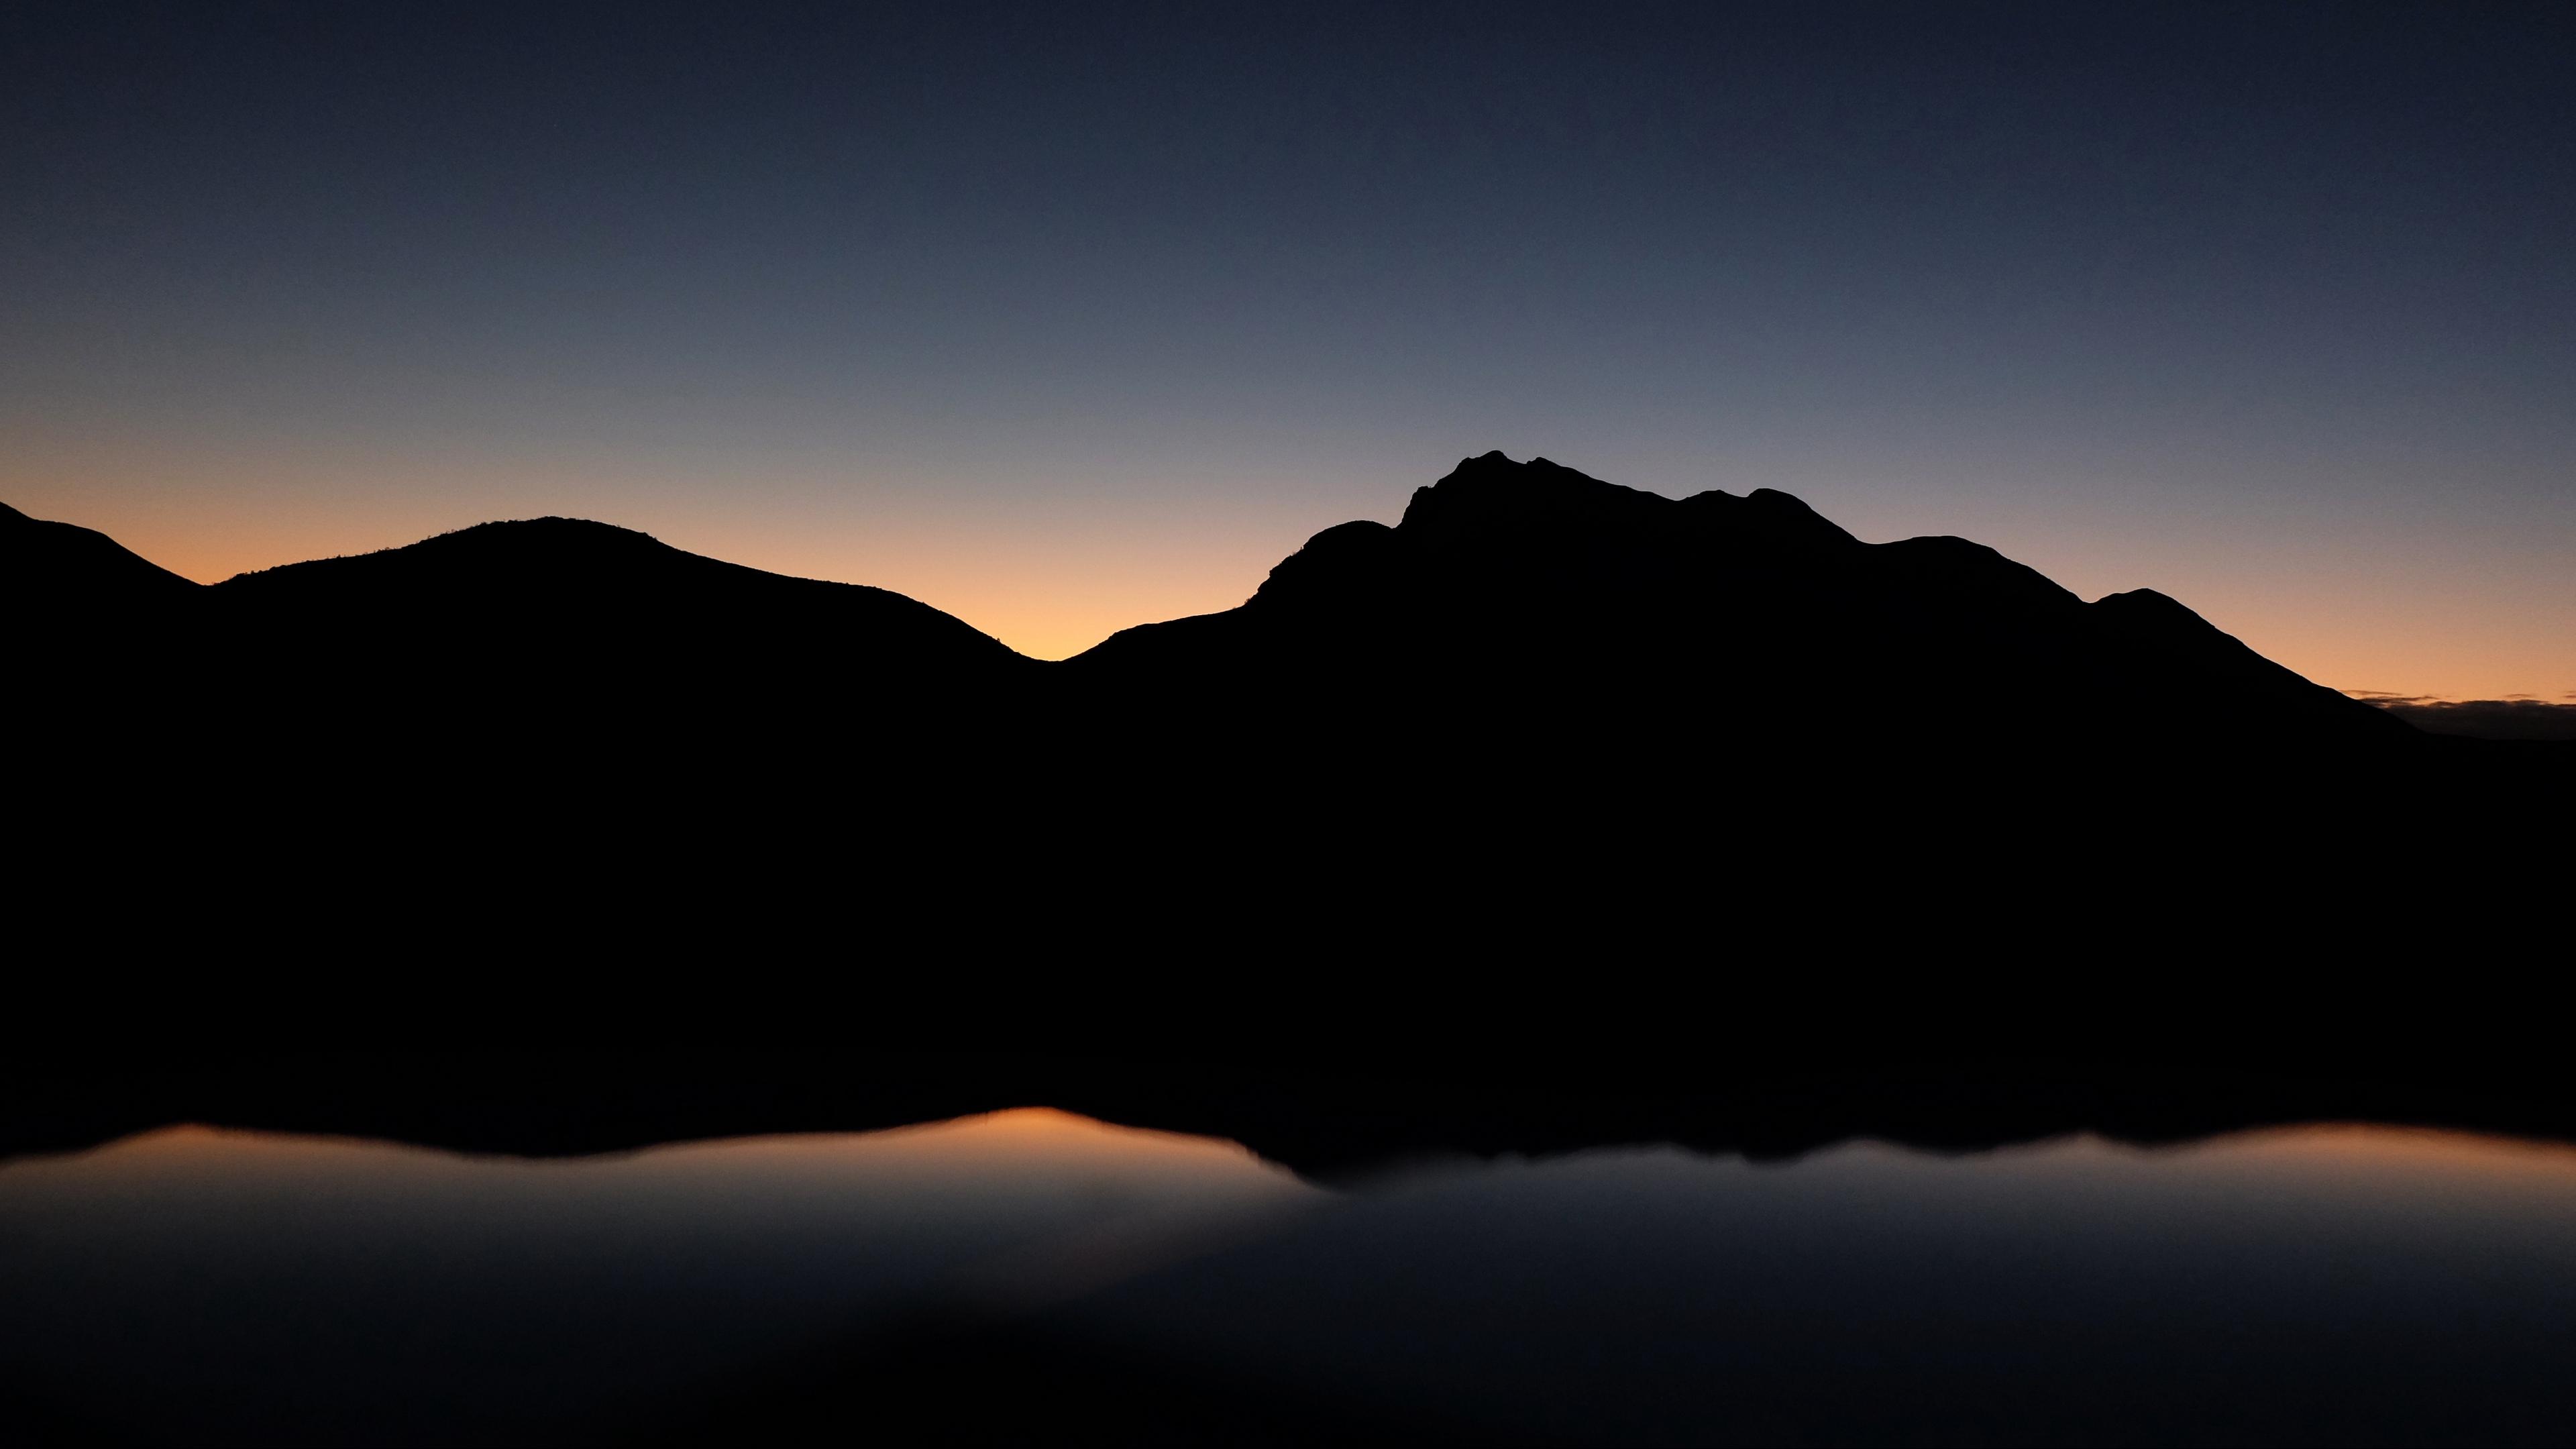 mountains hill dark 4k 1540574390 - mountains, hill, dark 4k - Mountains, hill, Dark